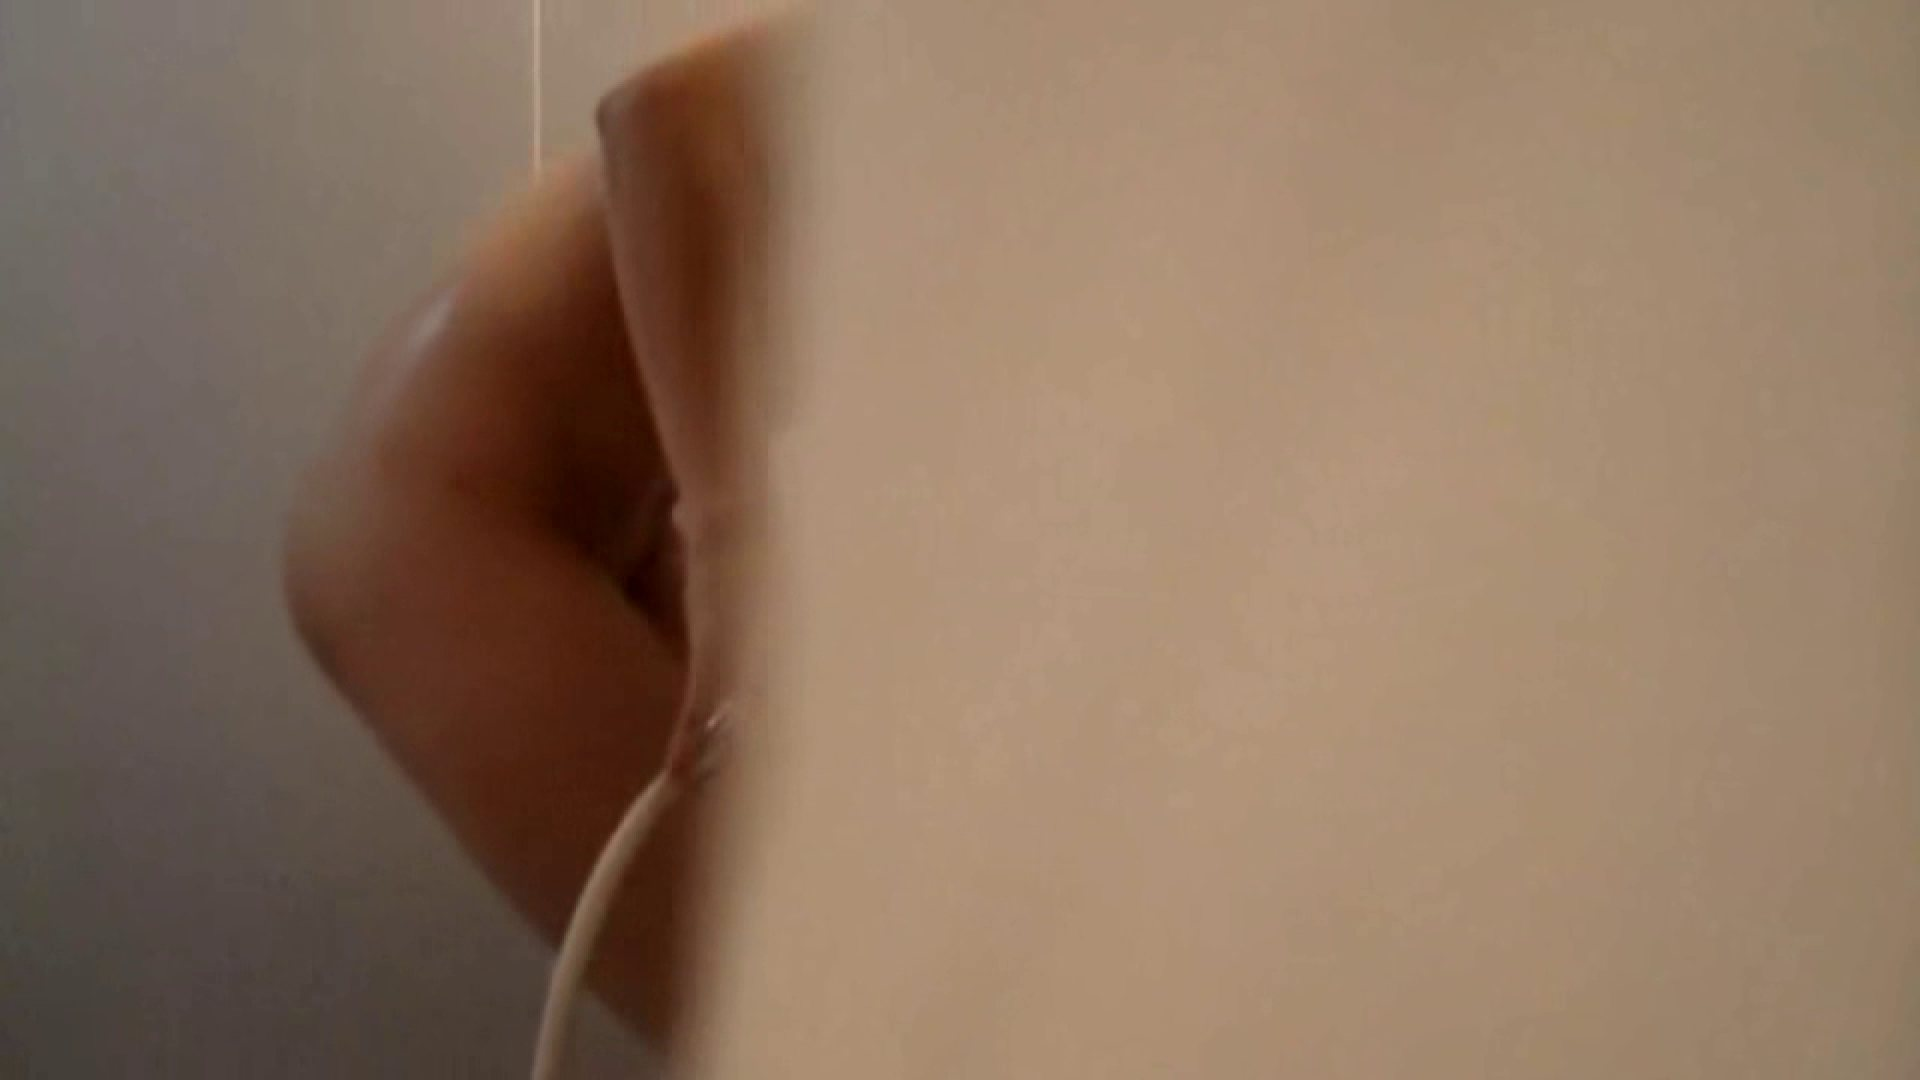 vol.2 葵のグラドル顔負けの爆乳を入浴シーンでどうぞ。 巨乳 エロ無料画像 111画像 29